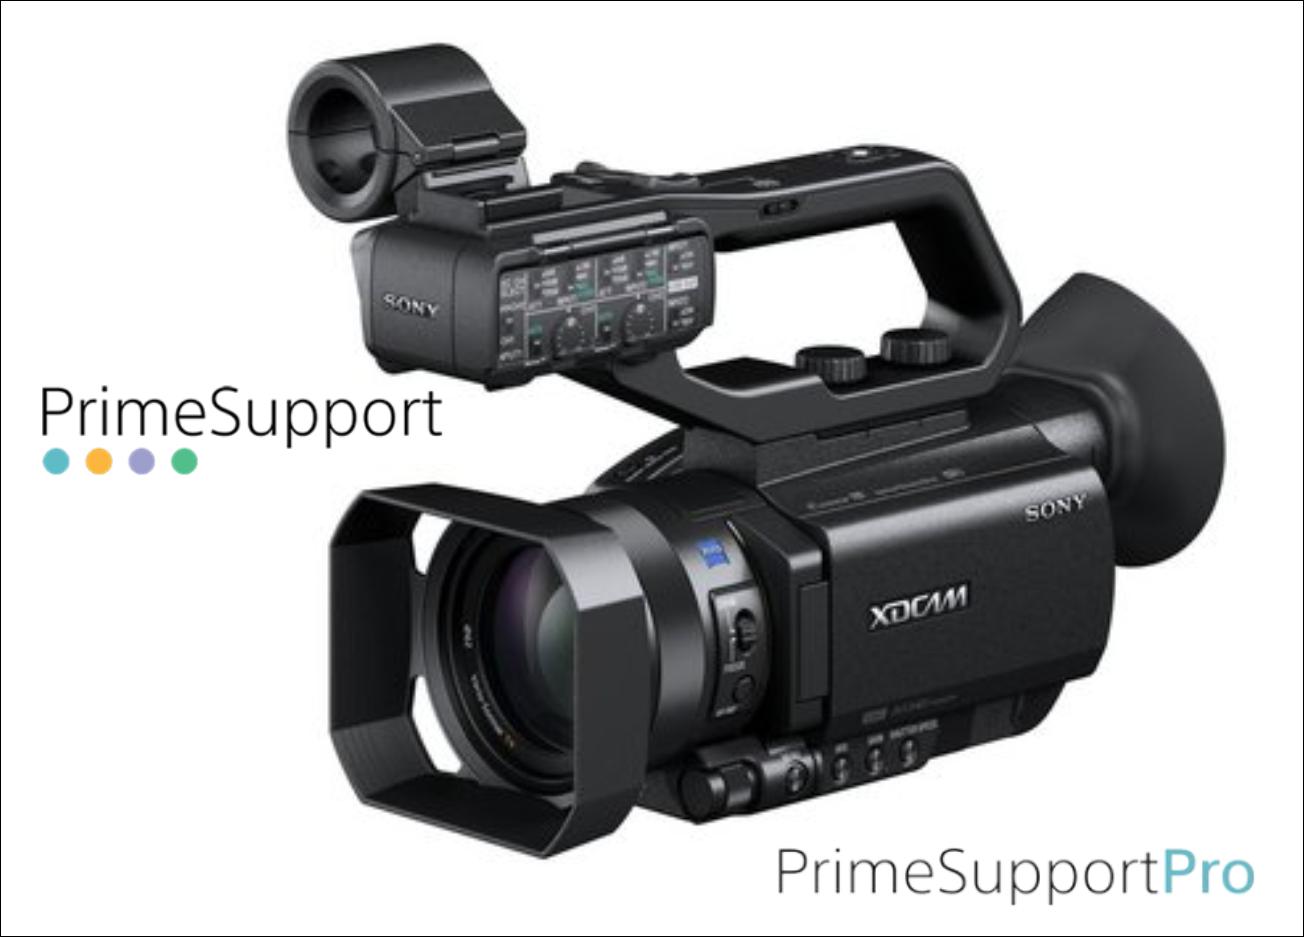 Sony PXW-X70 + 1 Ano de Garantia Adicional (Prime Support PRO)